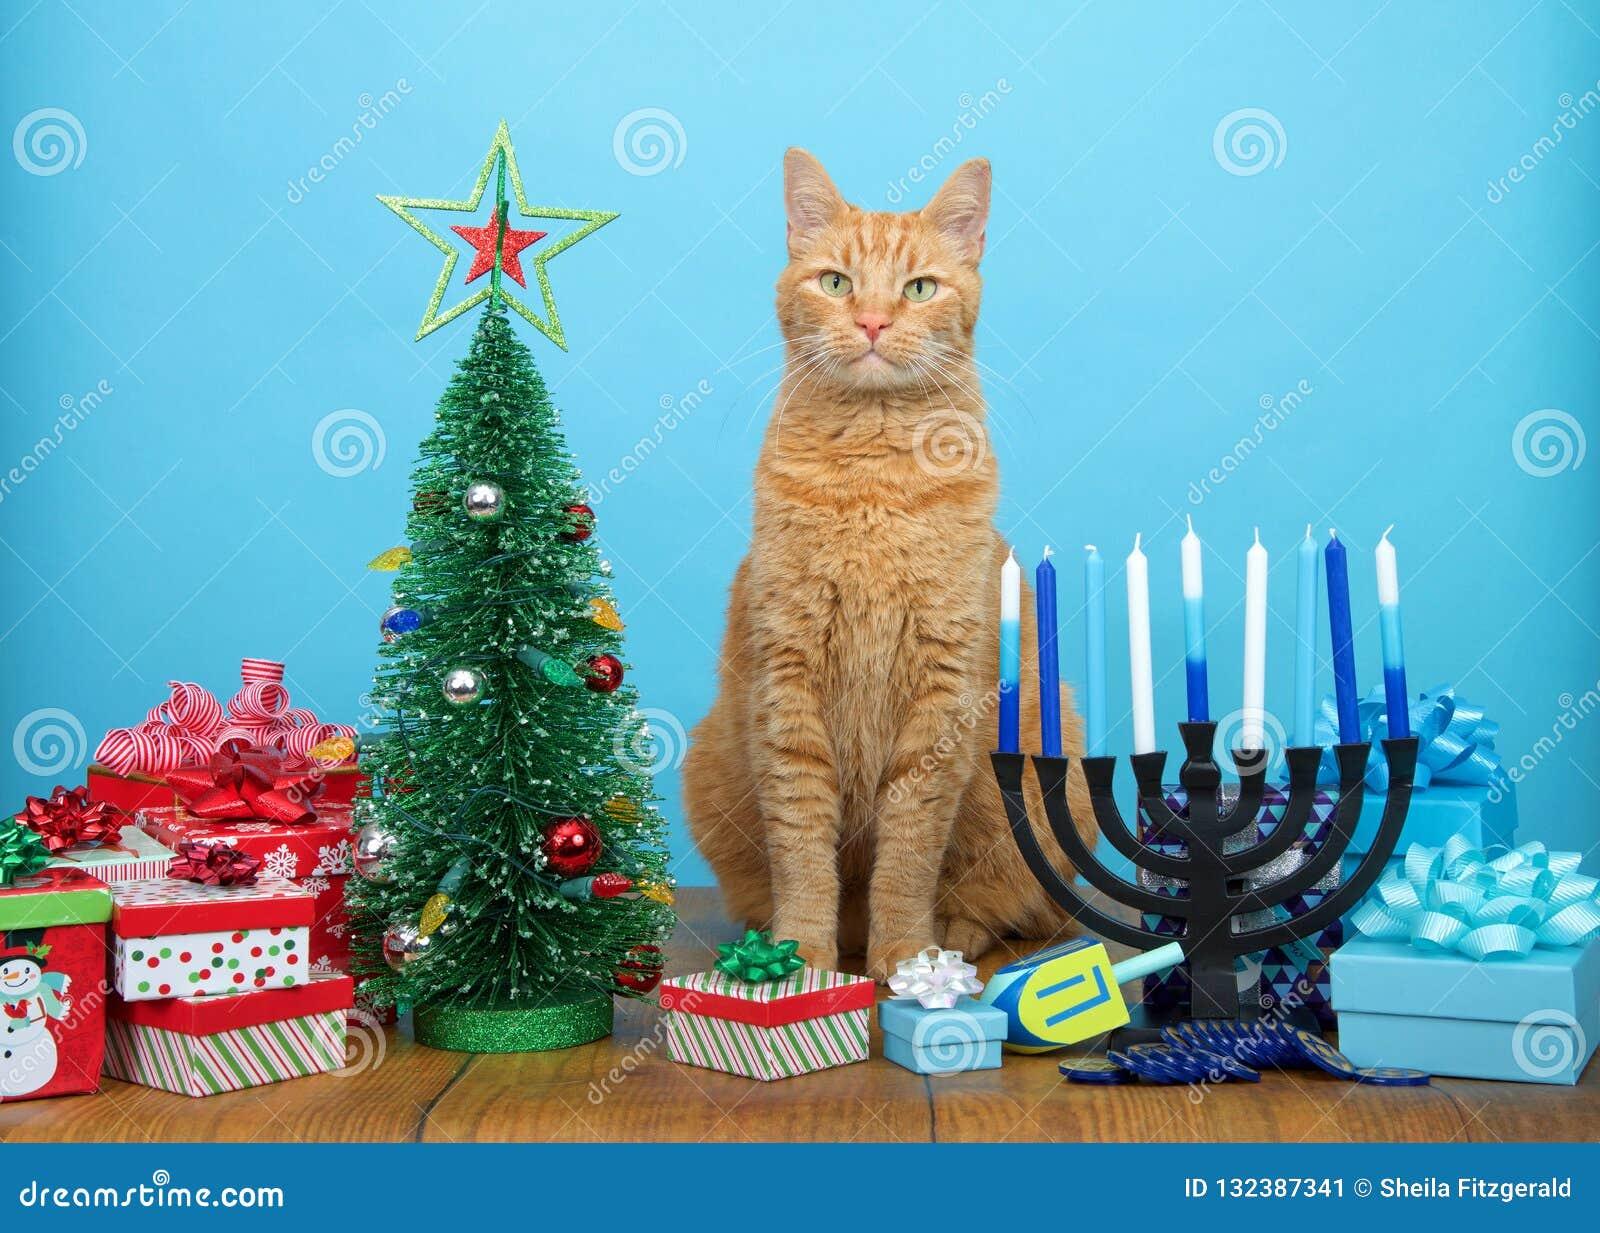 Tabby cat sitting between Christmas and Hanukkah decorations